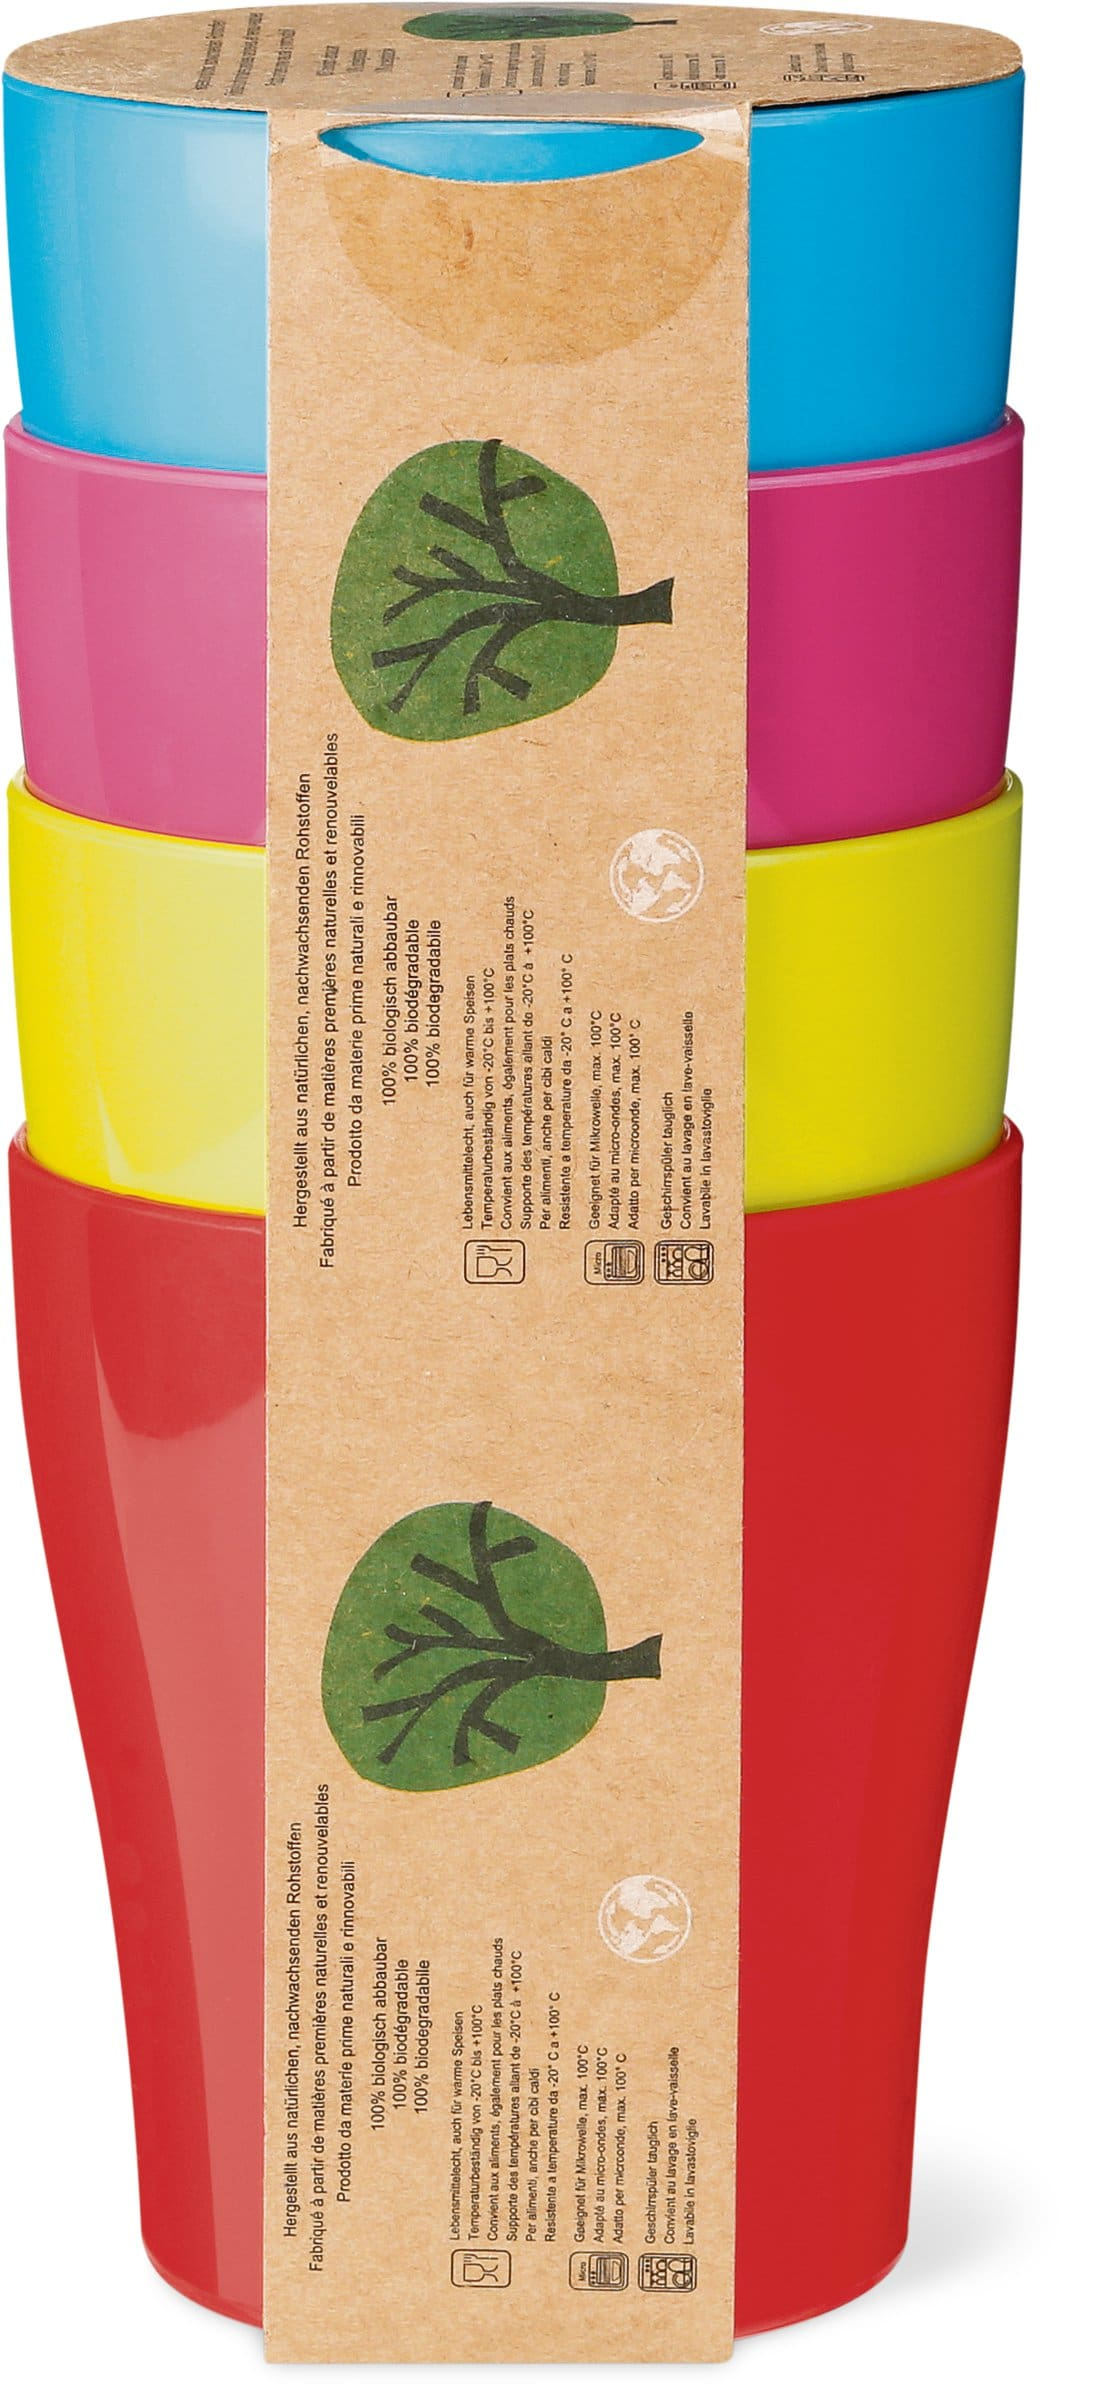 Cucina & Tavola CUCINA &TAVOLA Trinkbecher 4er Set